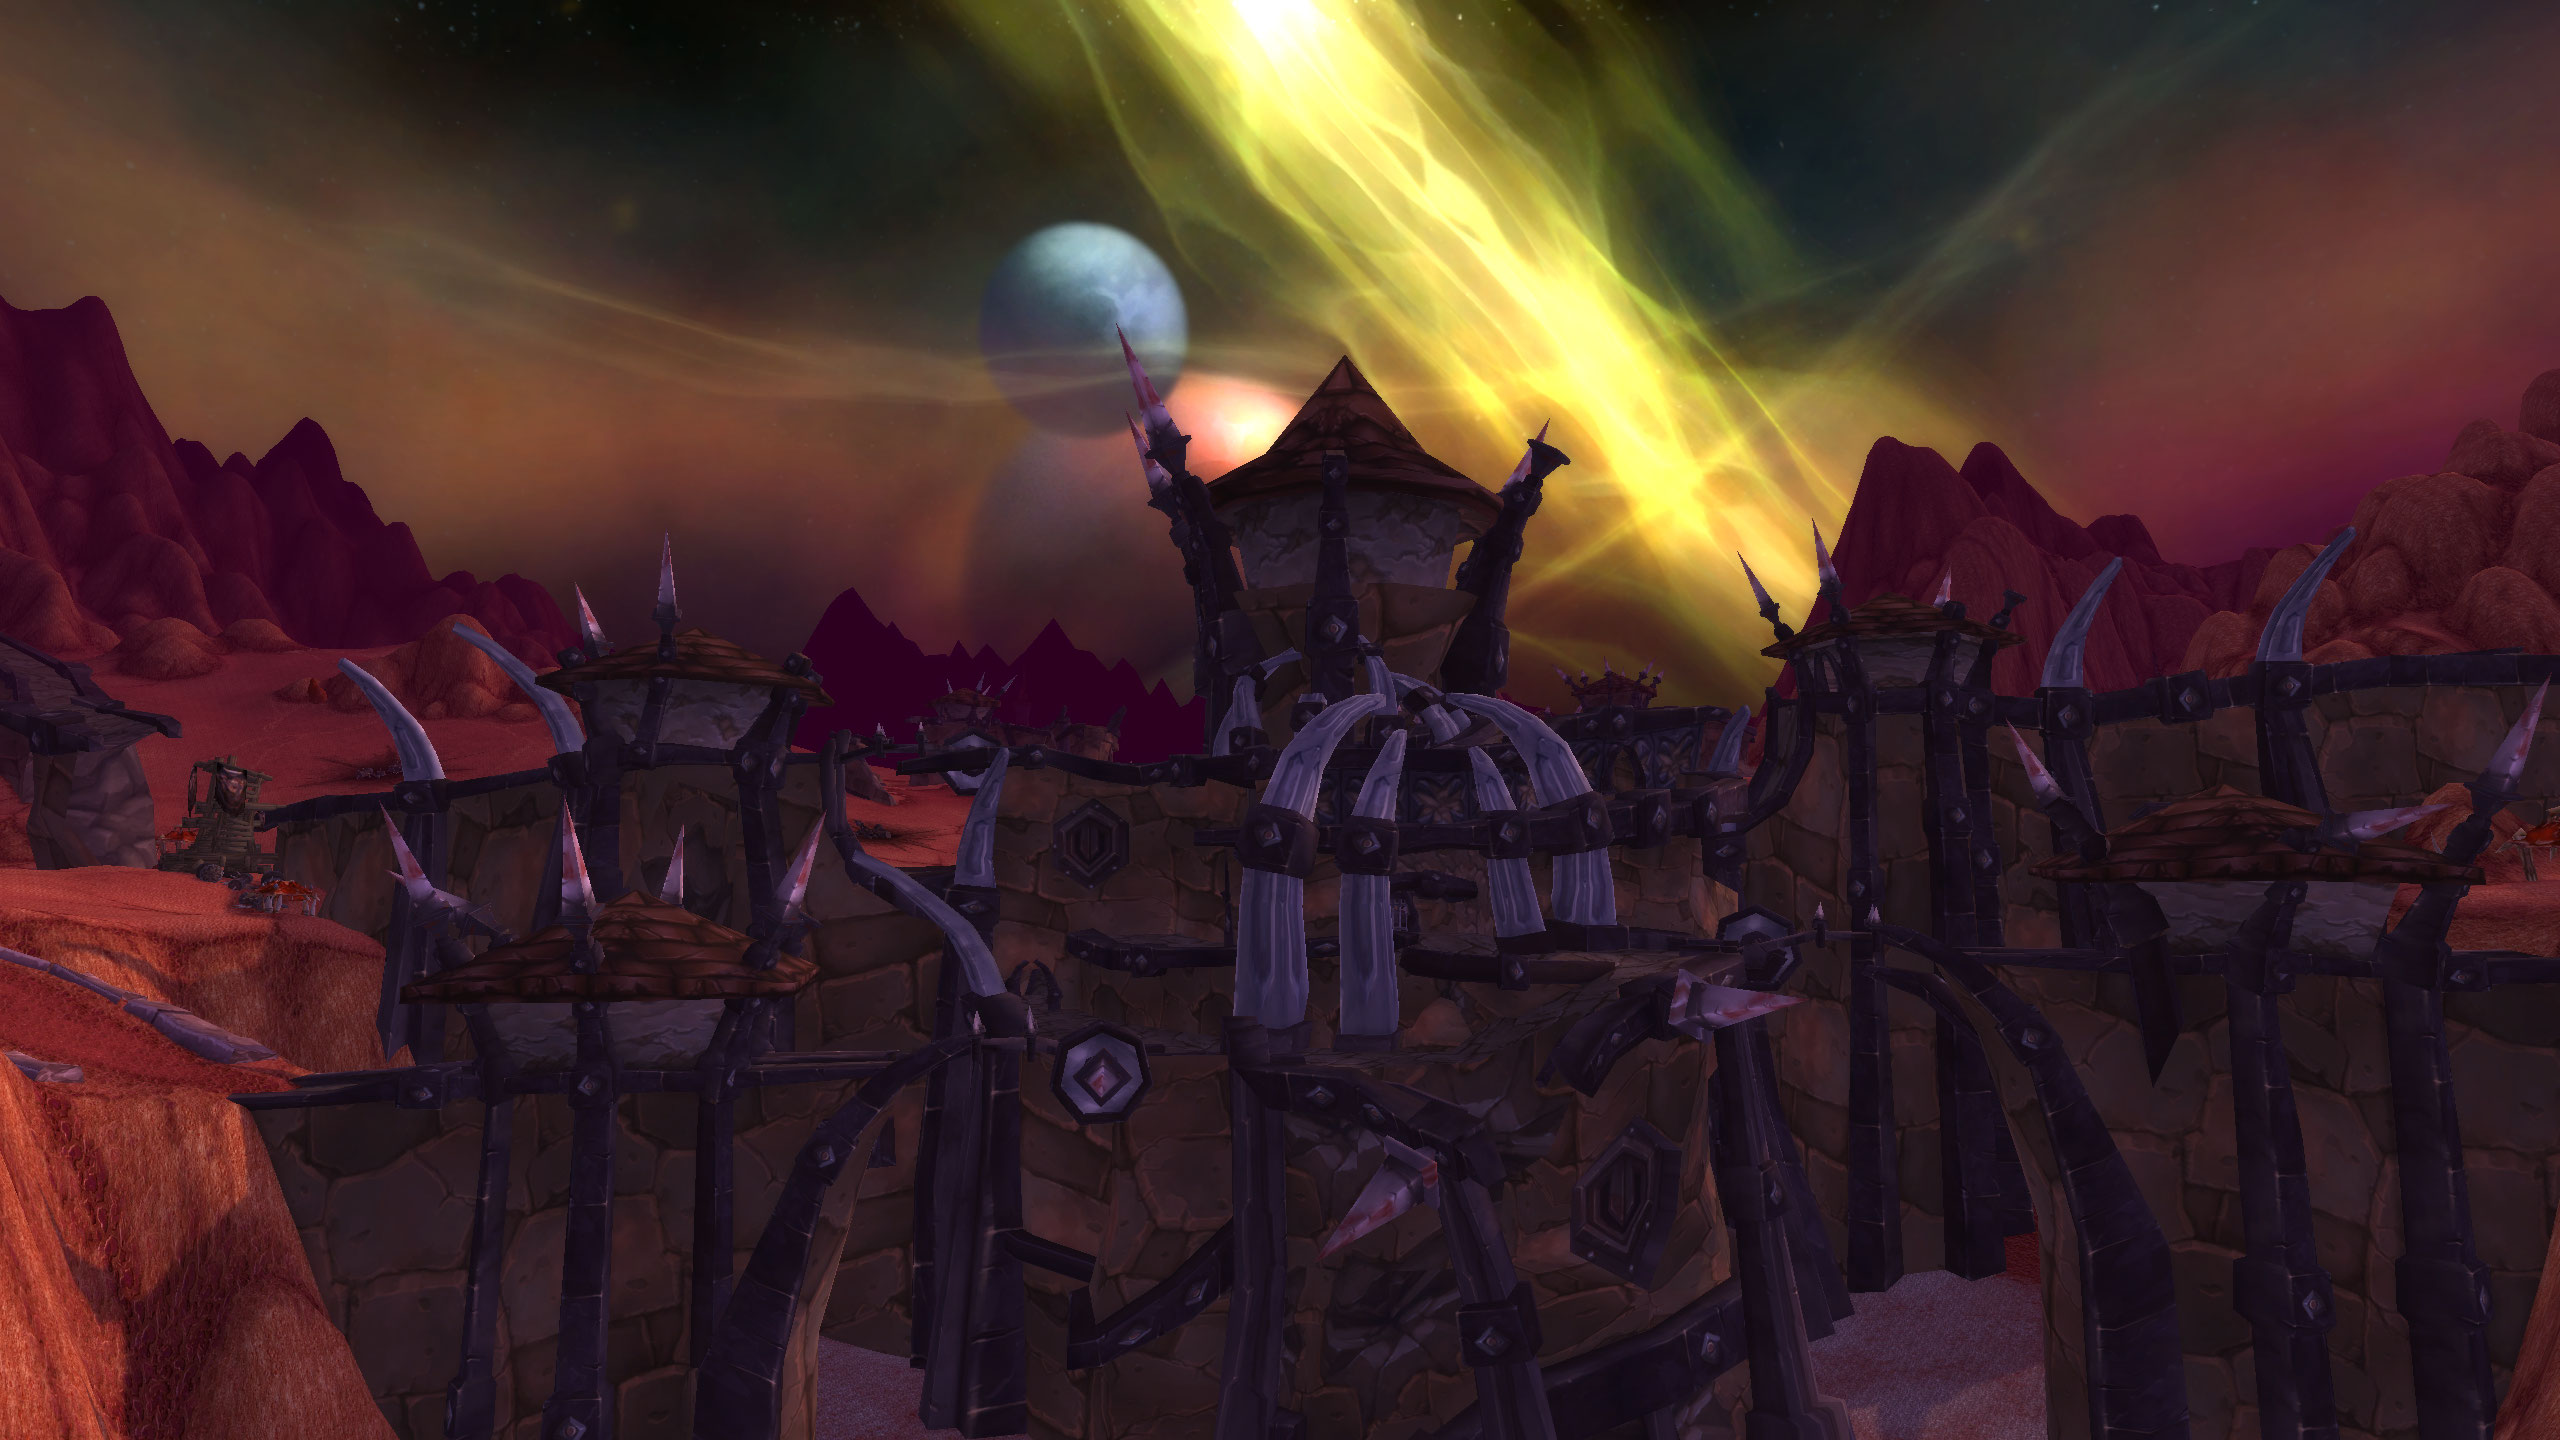 hellfire-citadel-wow-tbc